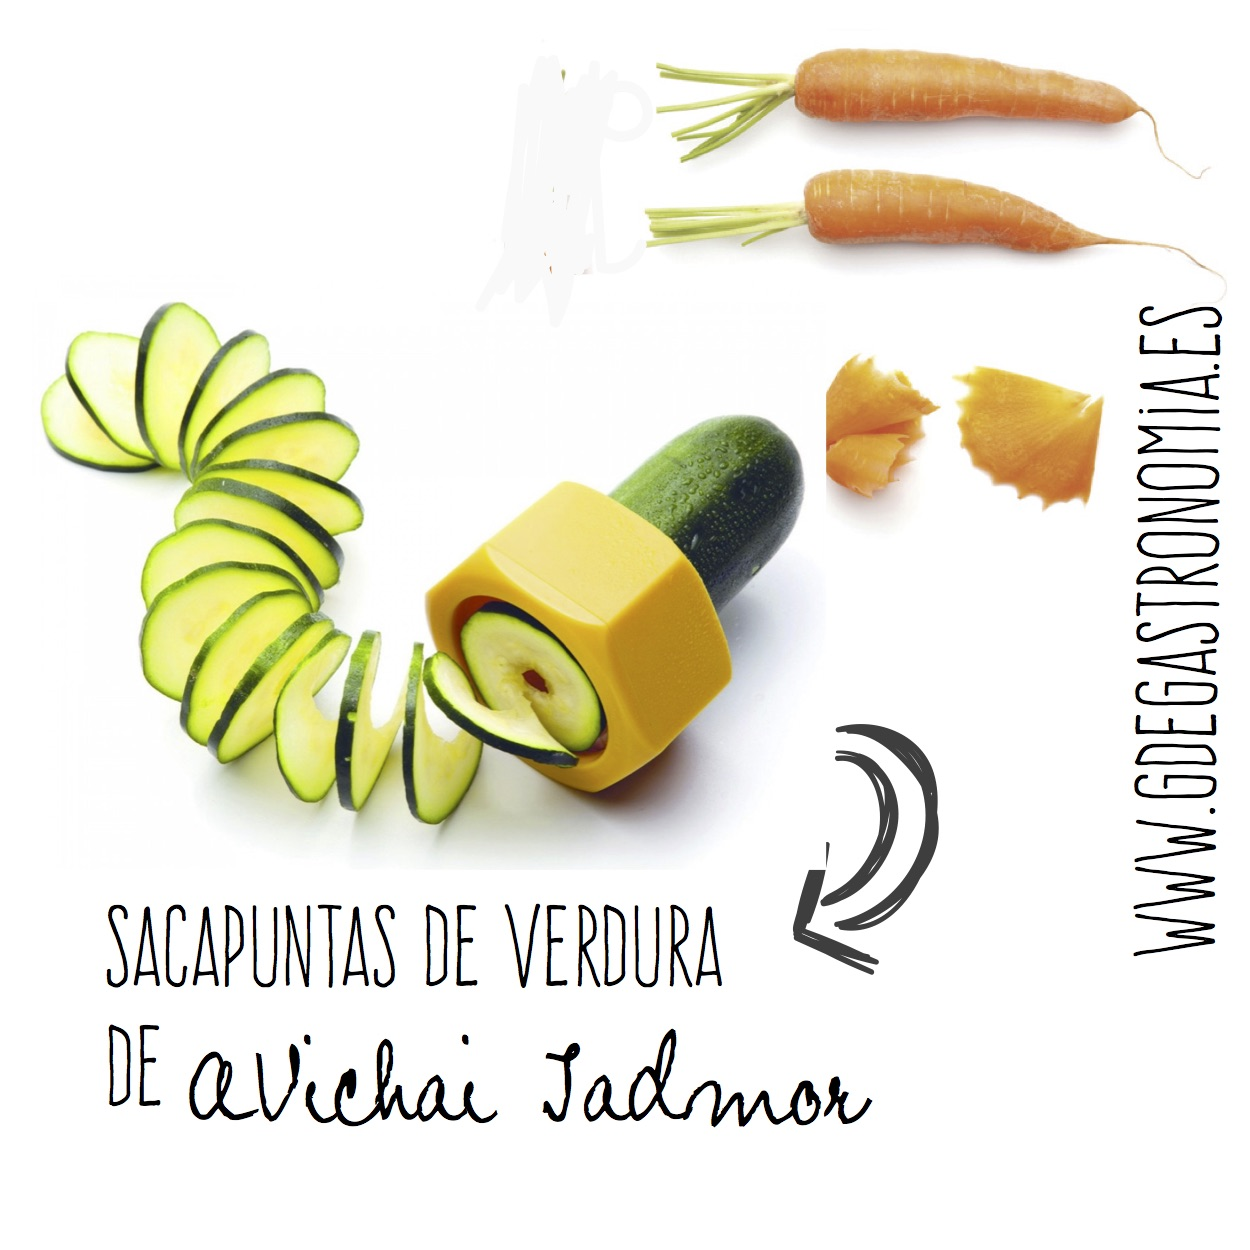 Sacapuntas de verdura de avichai Jadmor